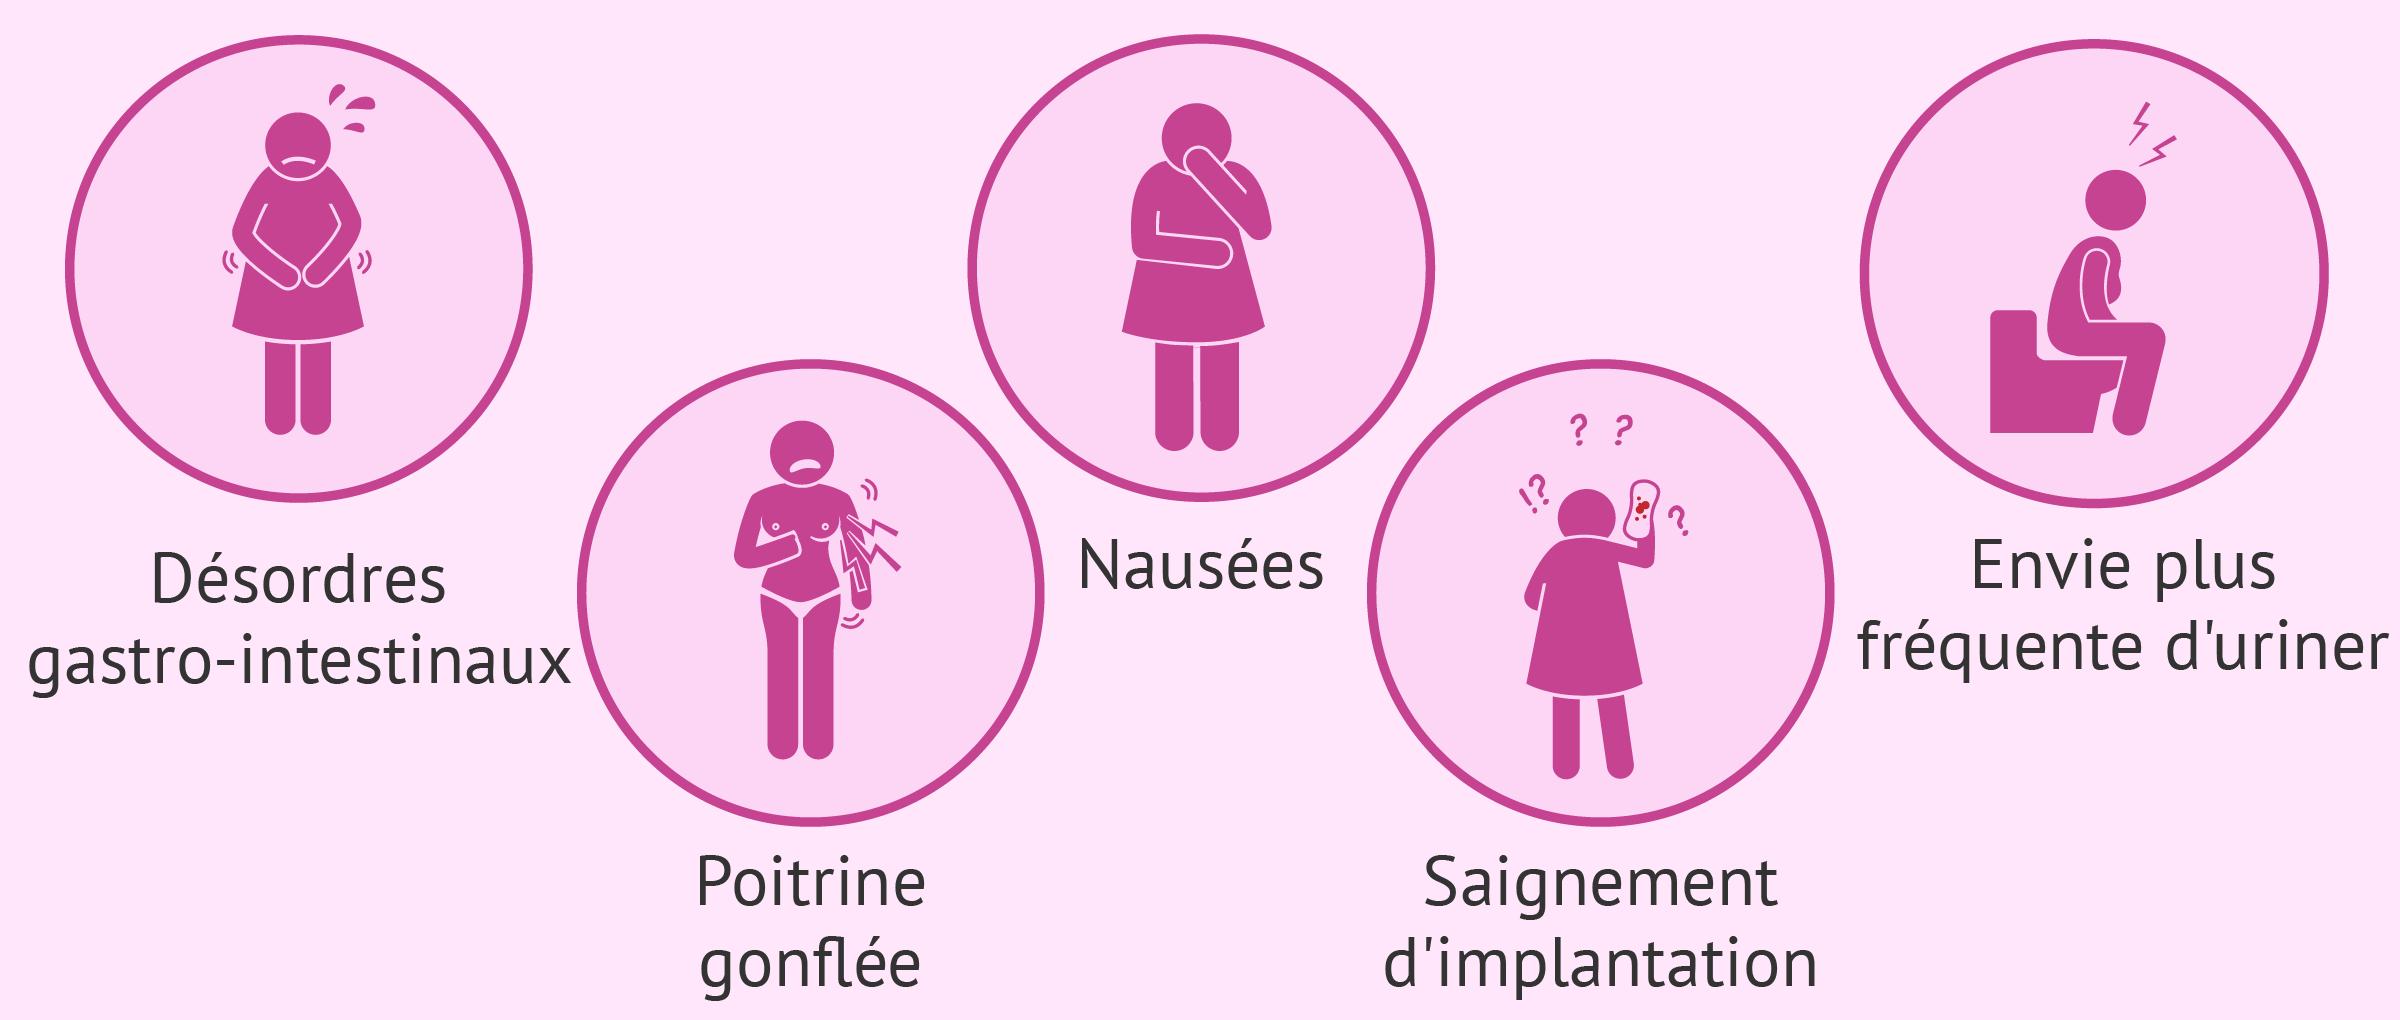 Principaux symptômes de l'implantation